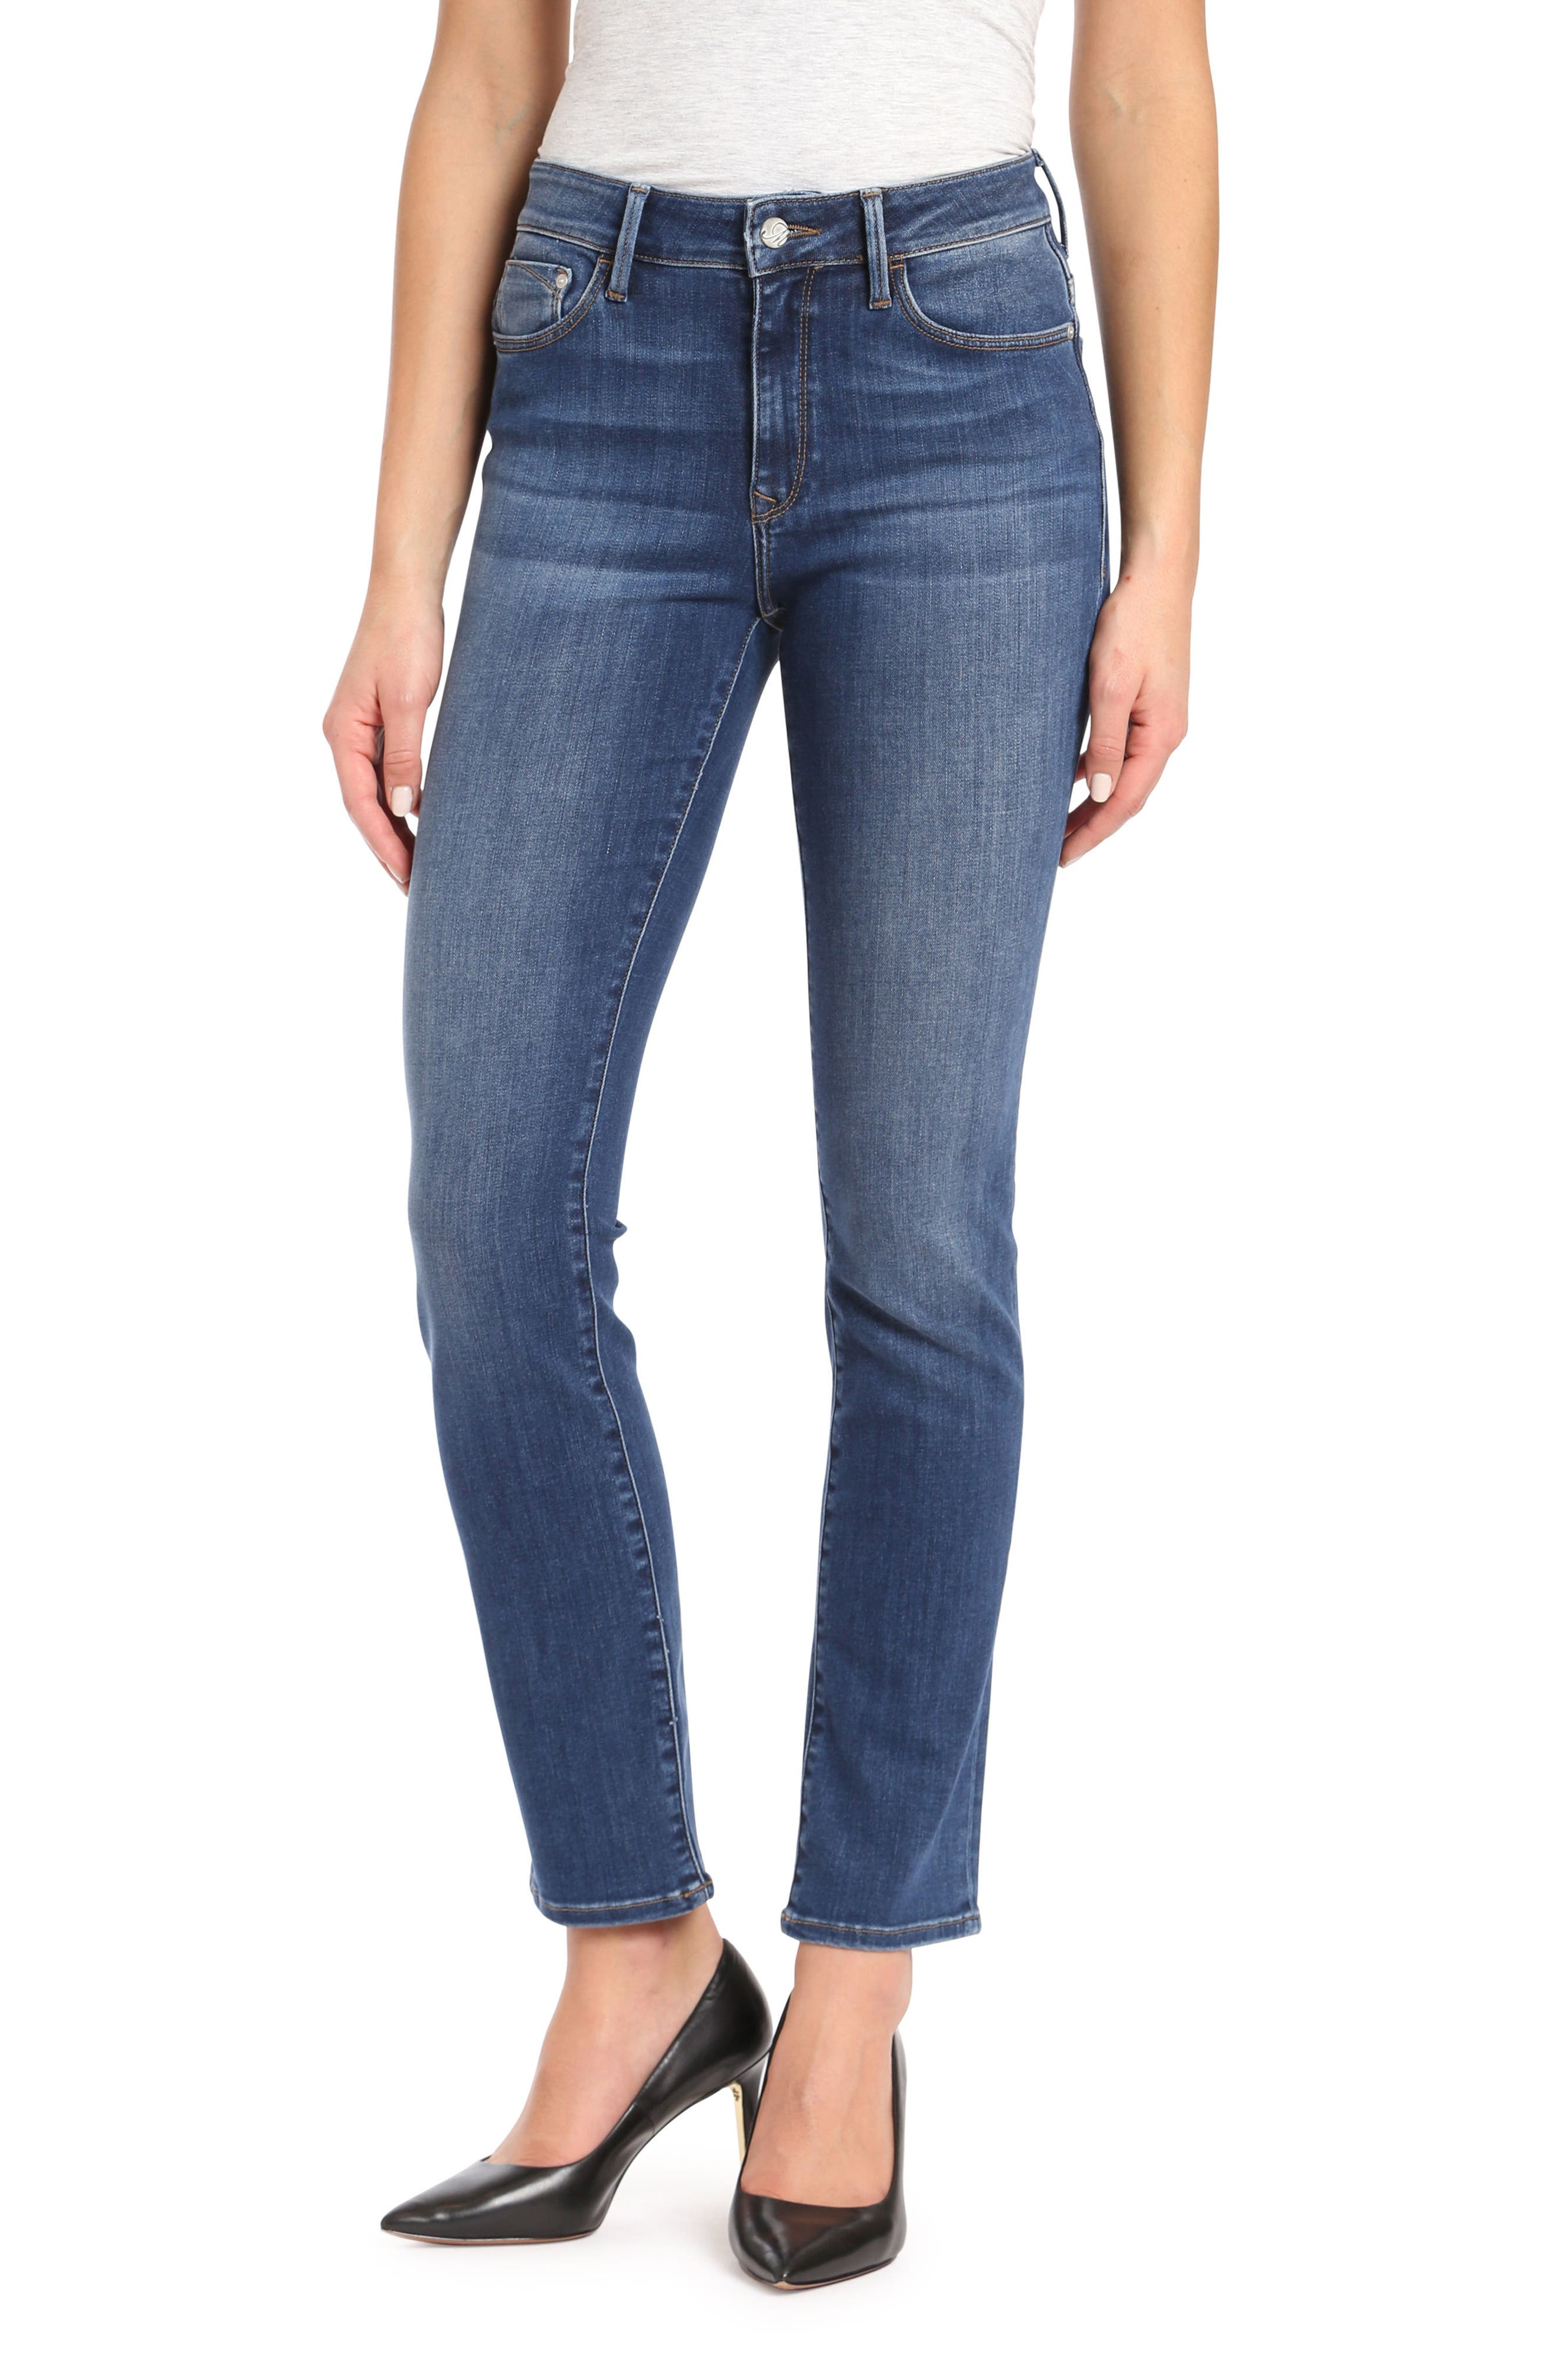 Alternate Image 1 Selected - Mavi Jeans Kendra Straight Leg Jeans (Indigo)